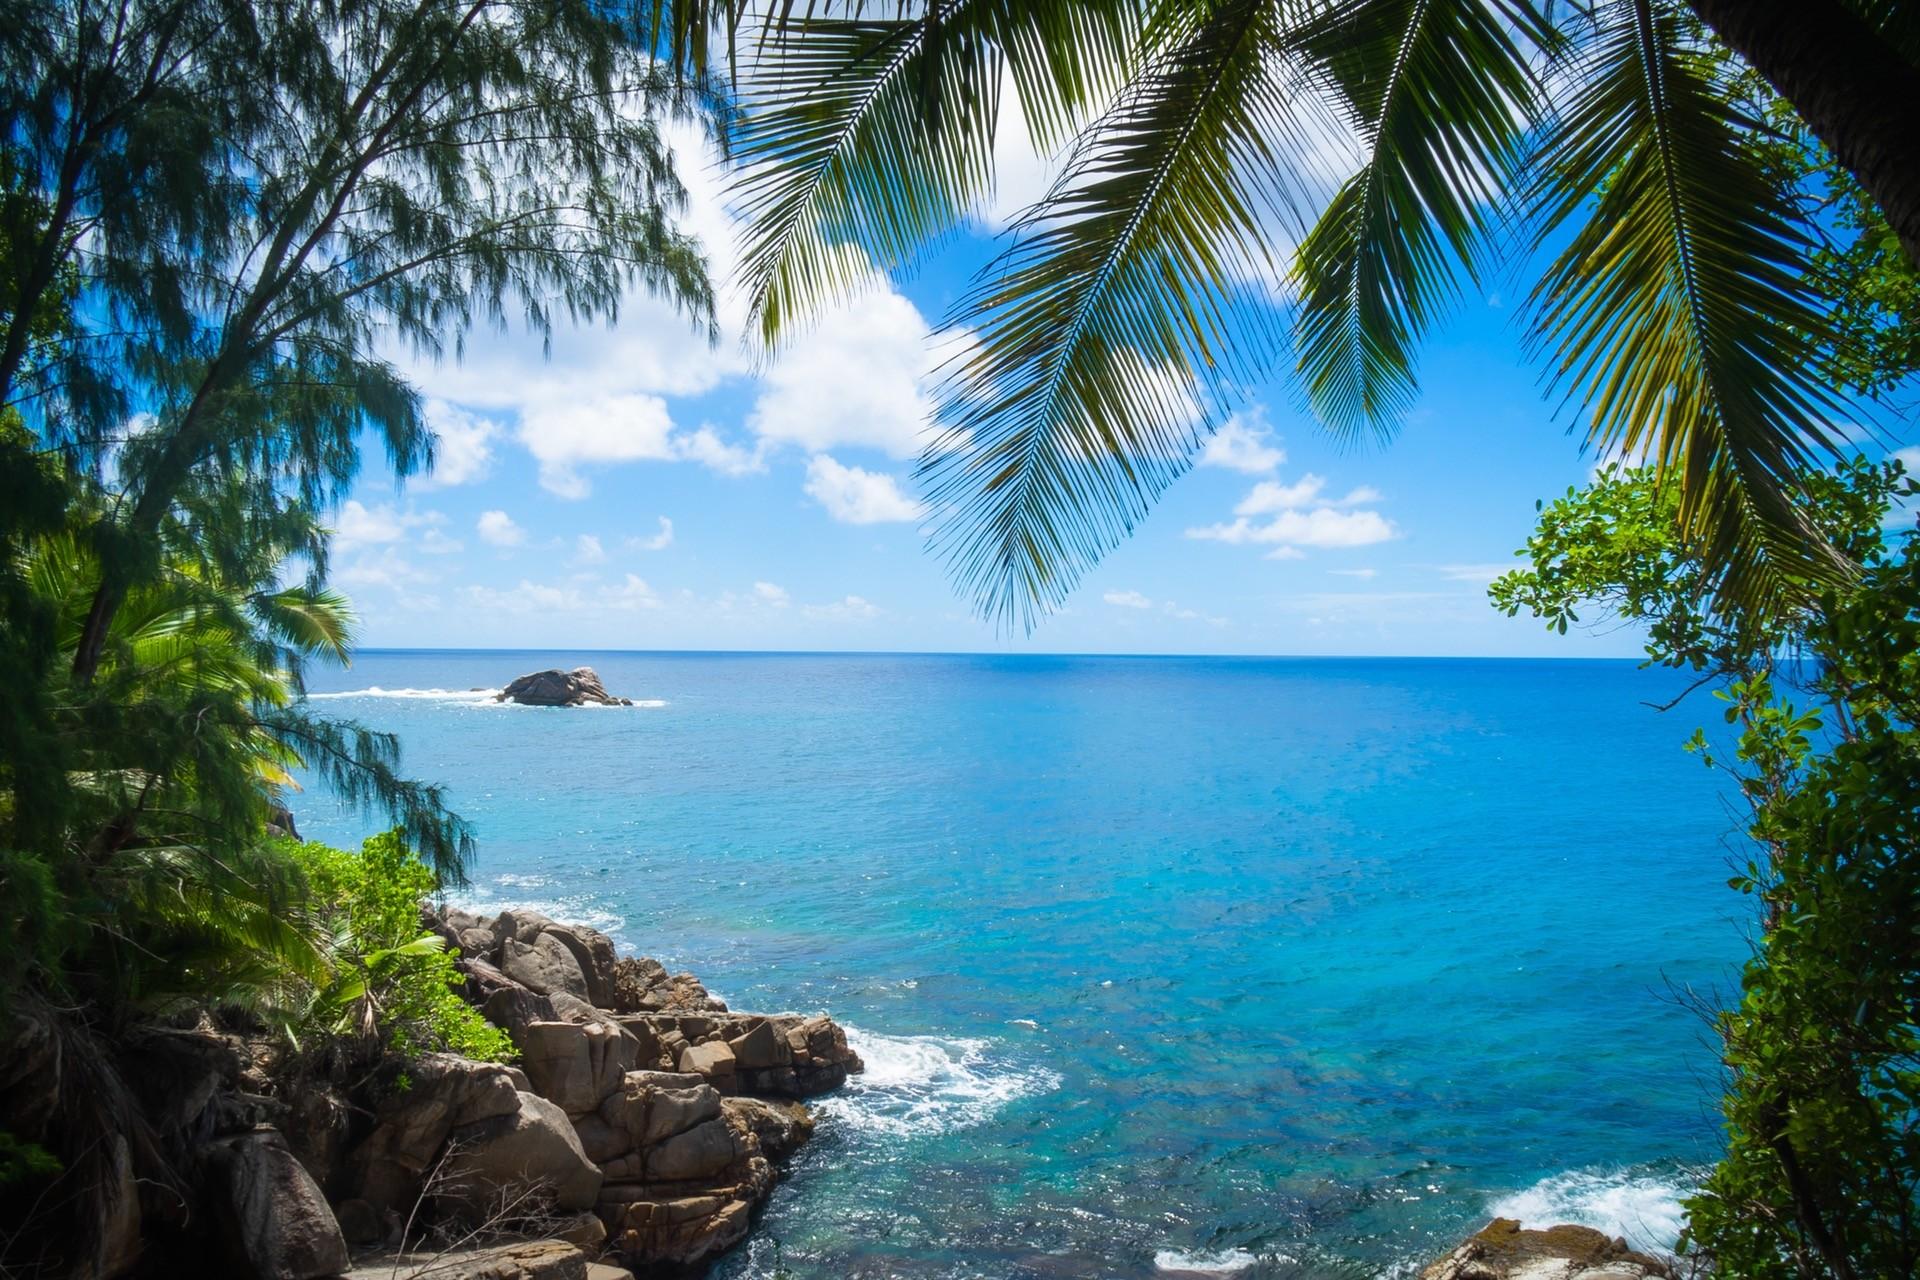 wallpaper sea bay clouds beach coast palm trees clear sky tropical island lagoon. Black Bedroom Furniture Sets. Home Design Ideas